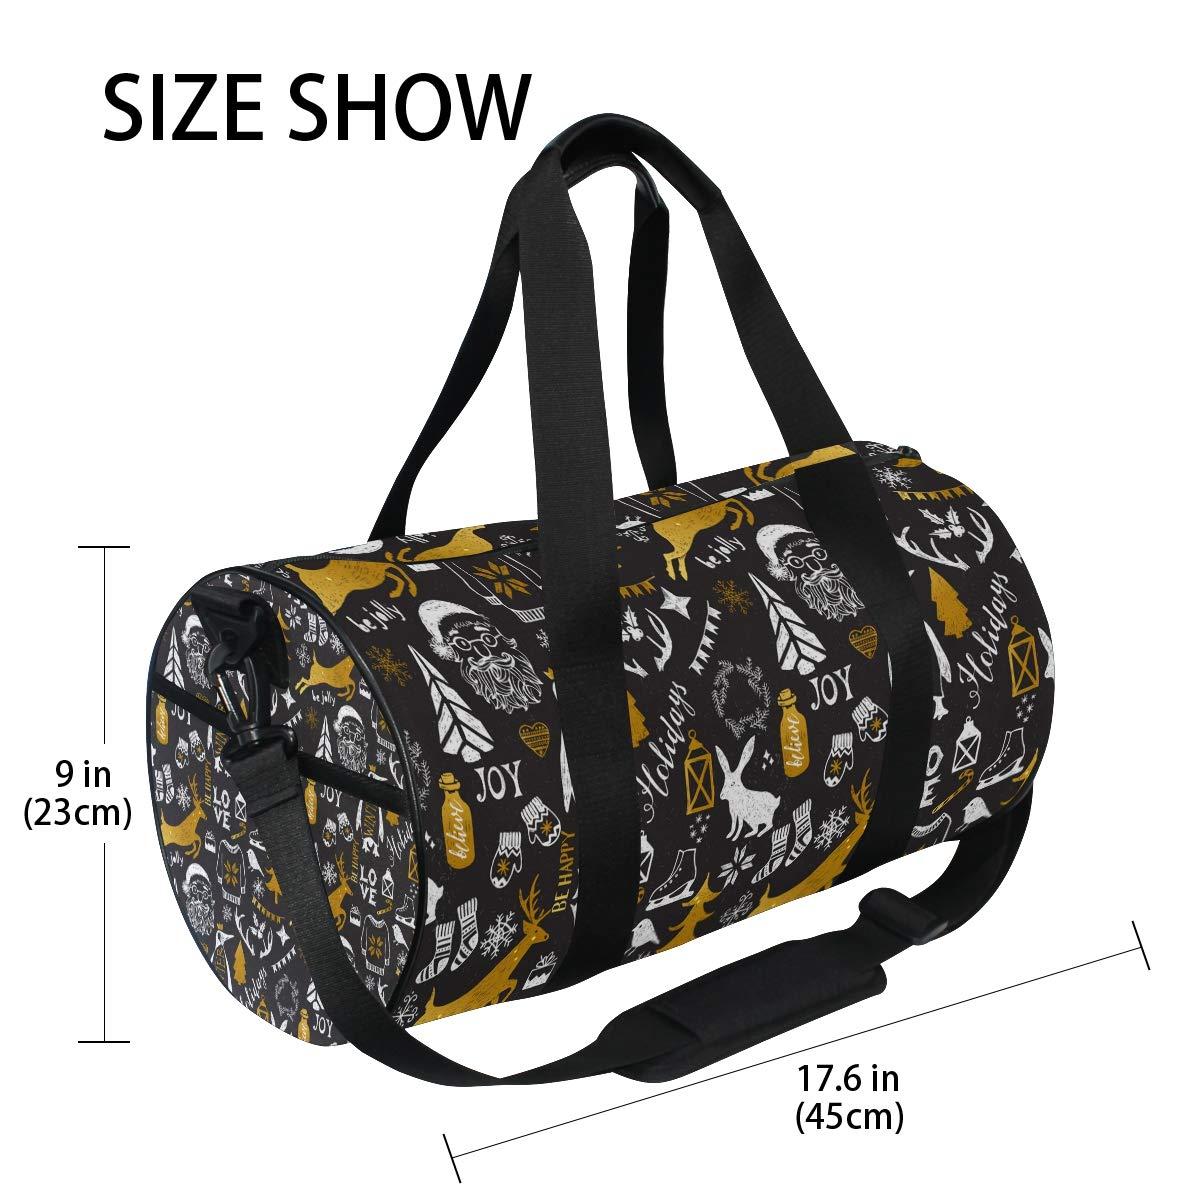 Nightmare Before Christmas Decorations Gift Popular casual fitness bag,Non-Slip Wearable Crossbody Bag Waterproof Shoulder Bag.